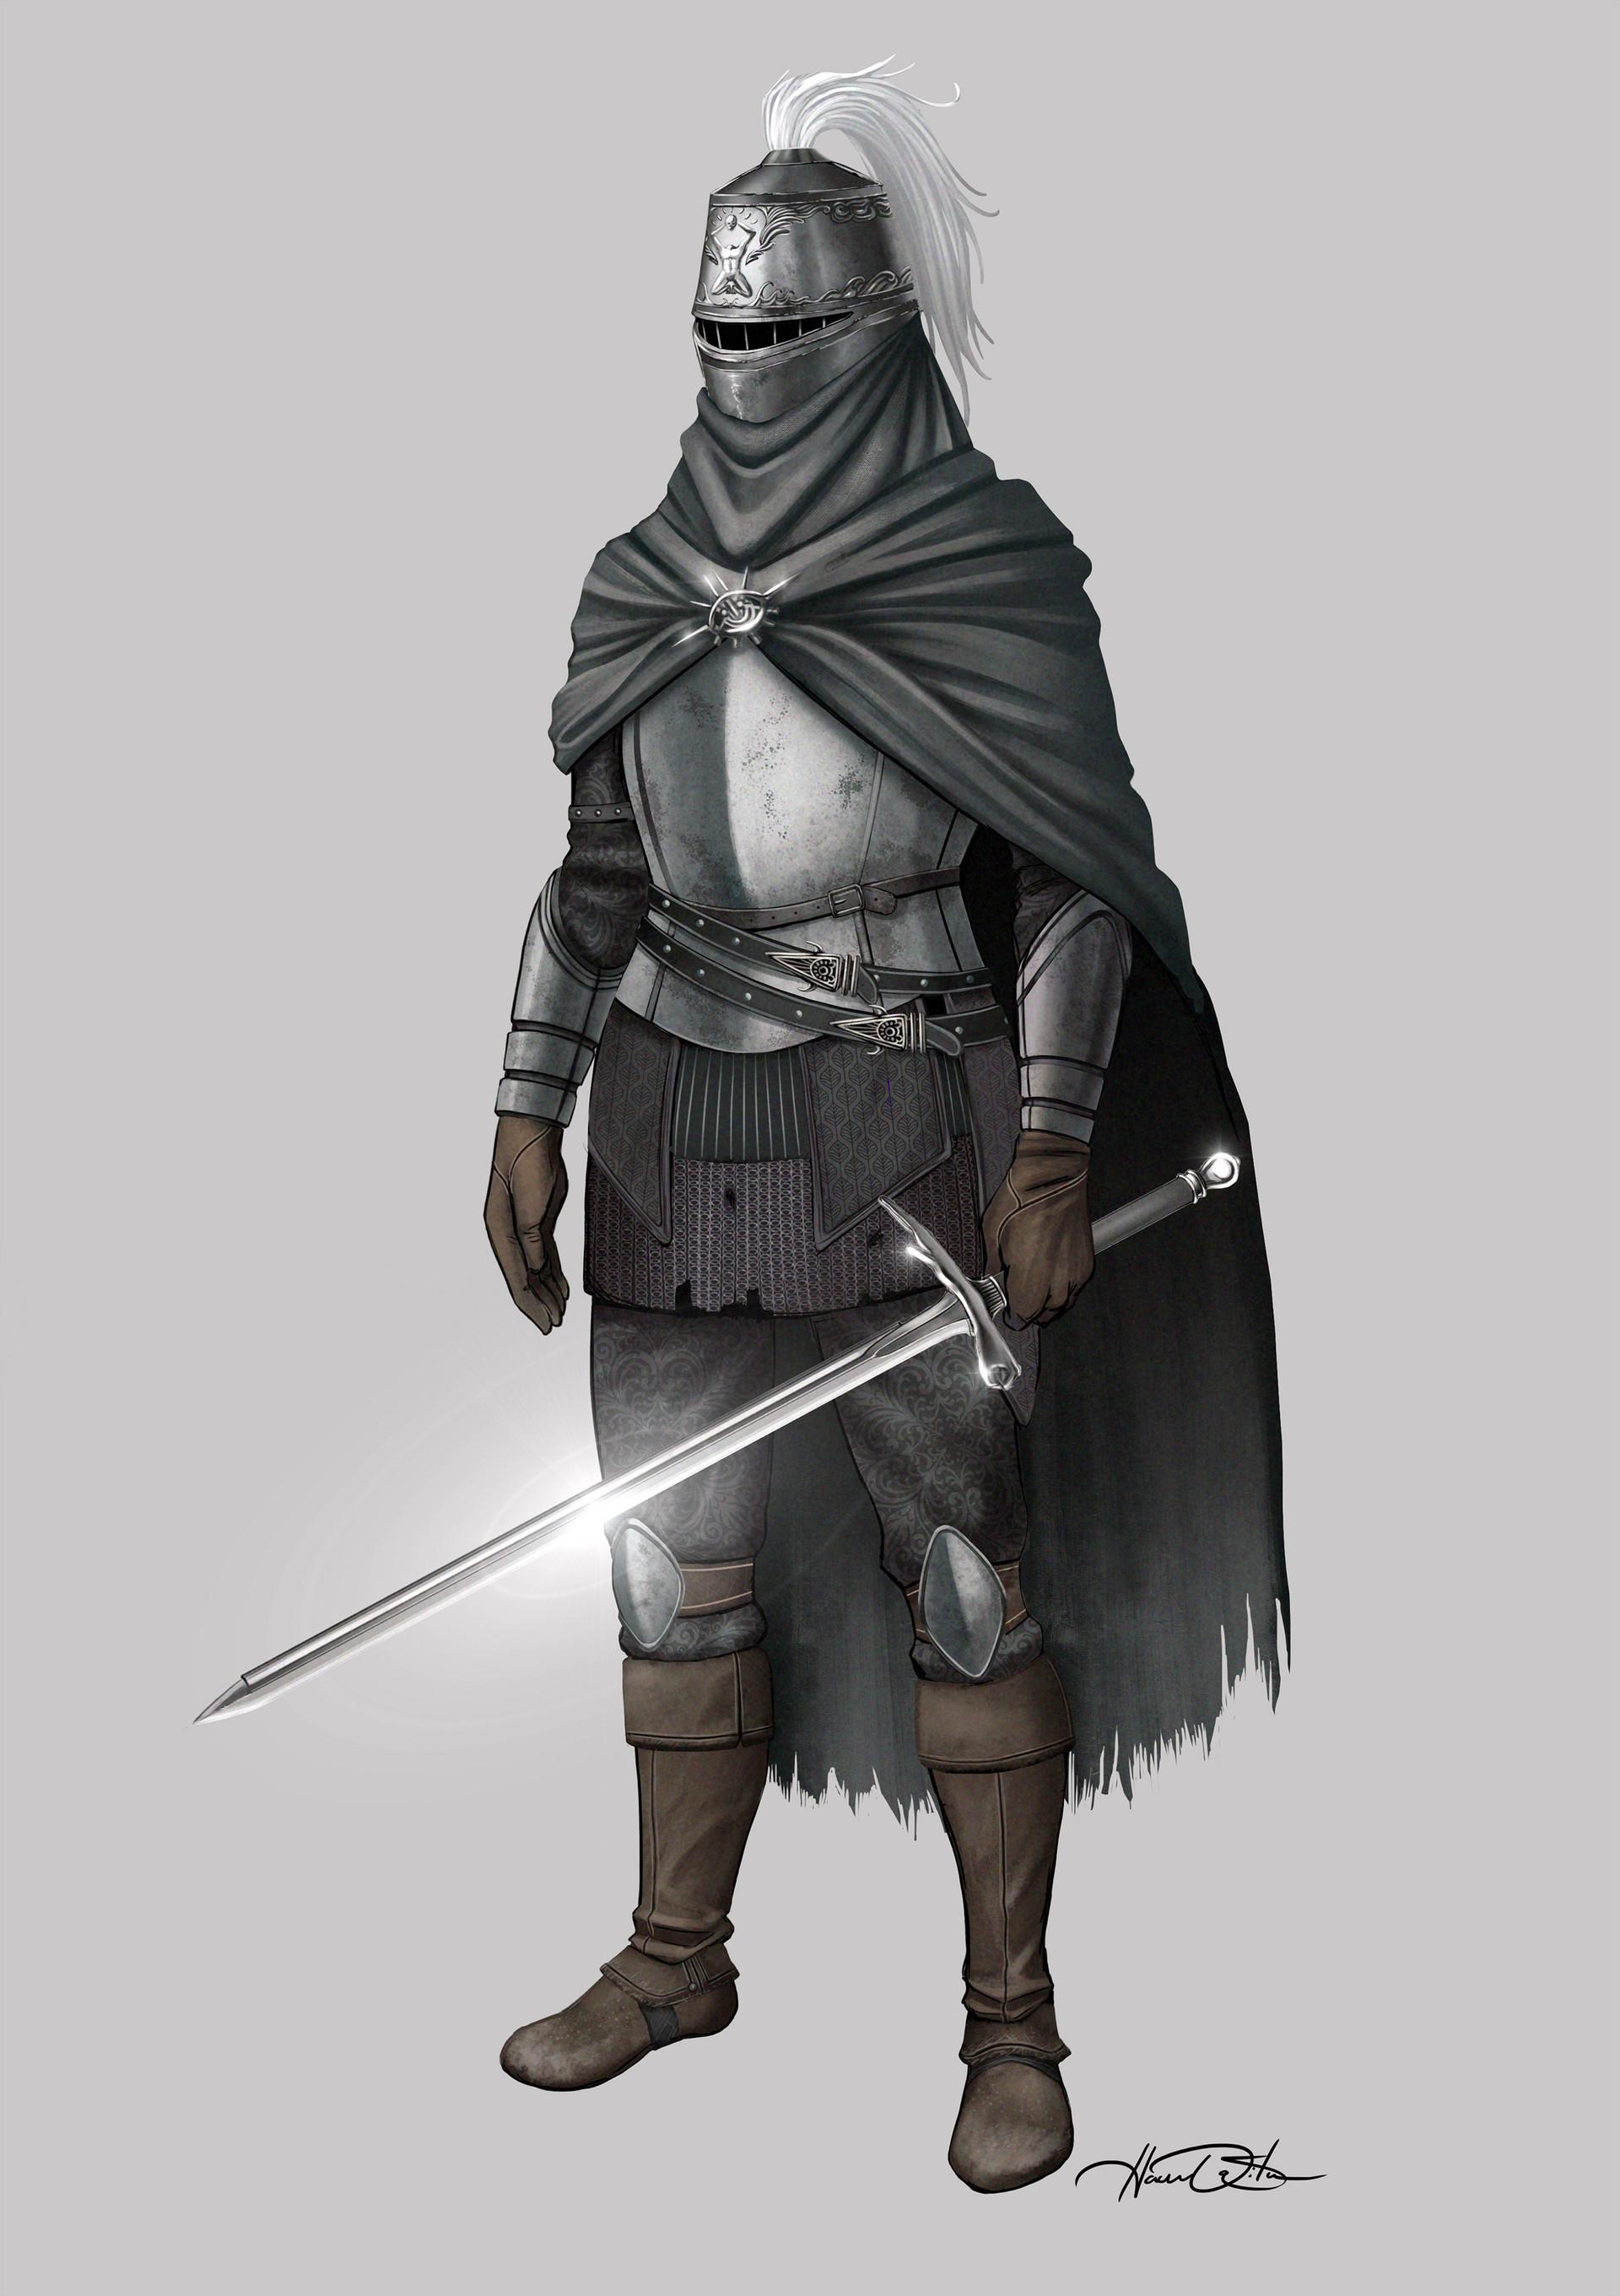 haven-dasilva-silver-knight.jpg